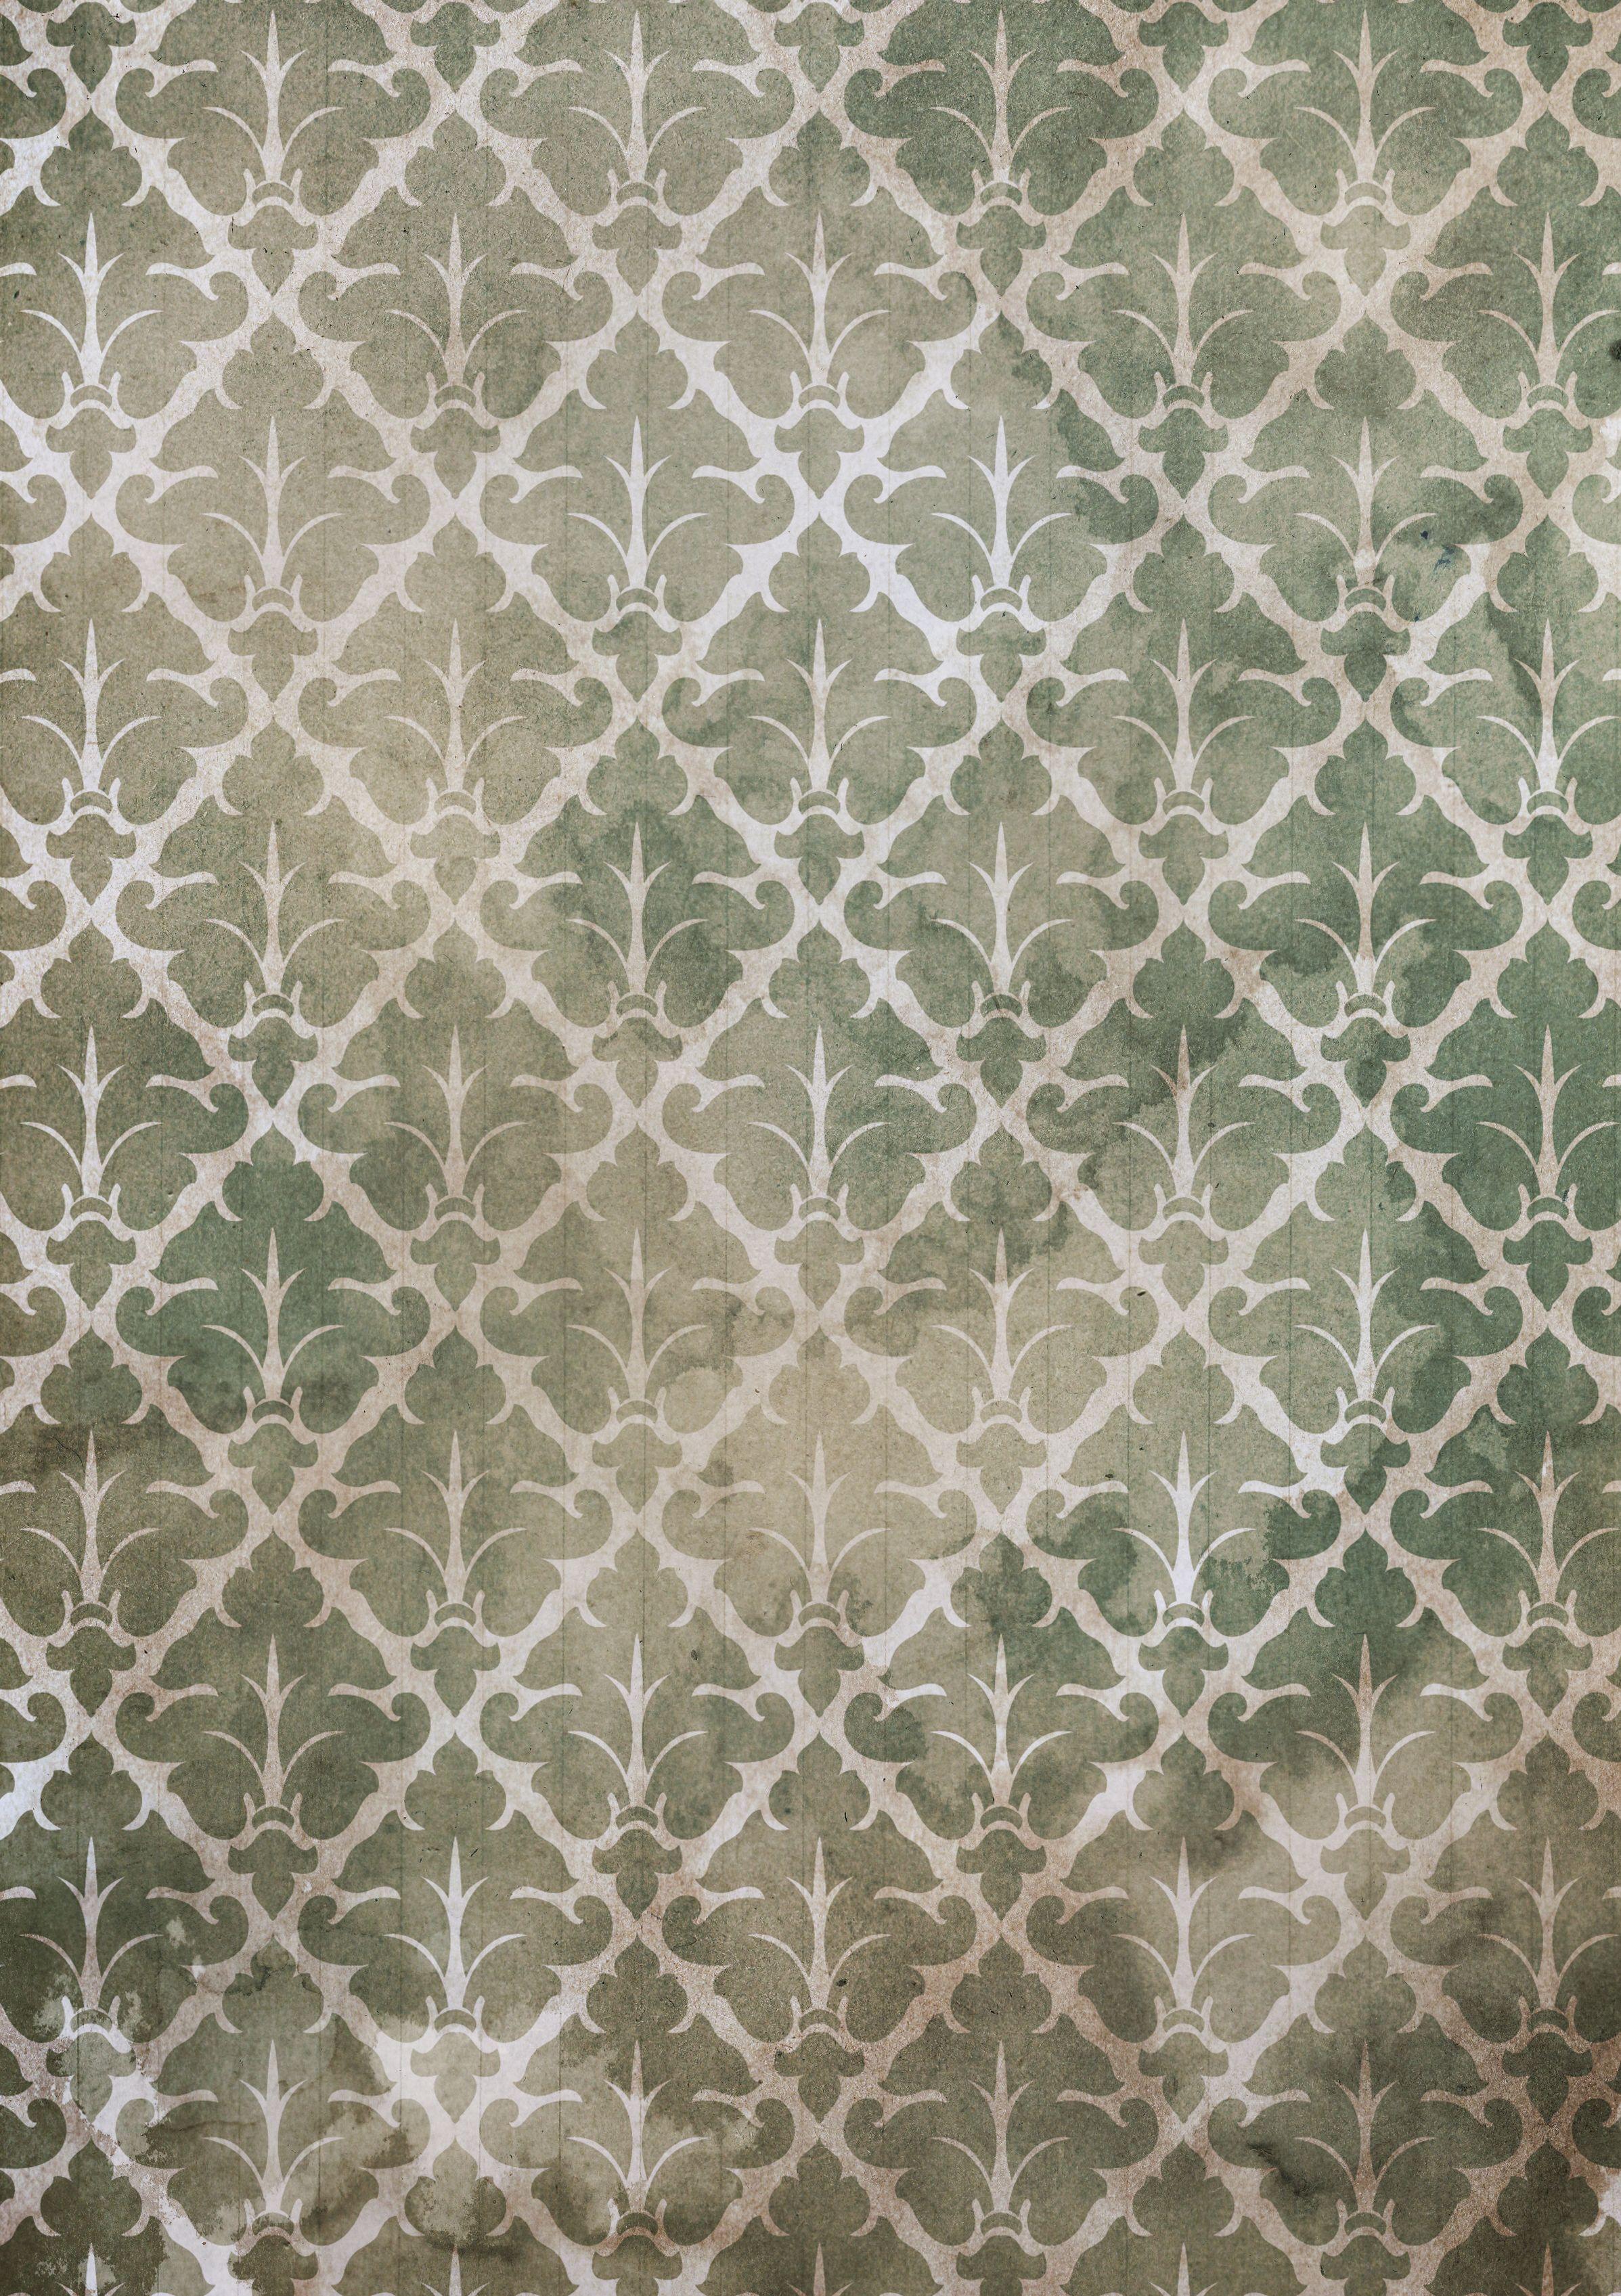 Best Vintage Paper Wallpaper Texture Textured Wallpaper 400 x 300